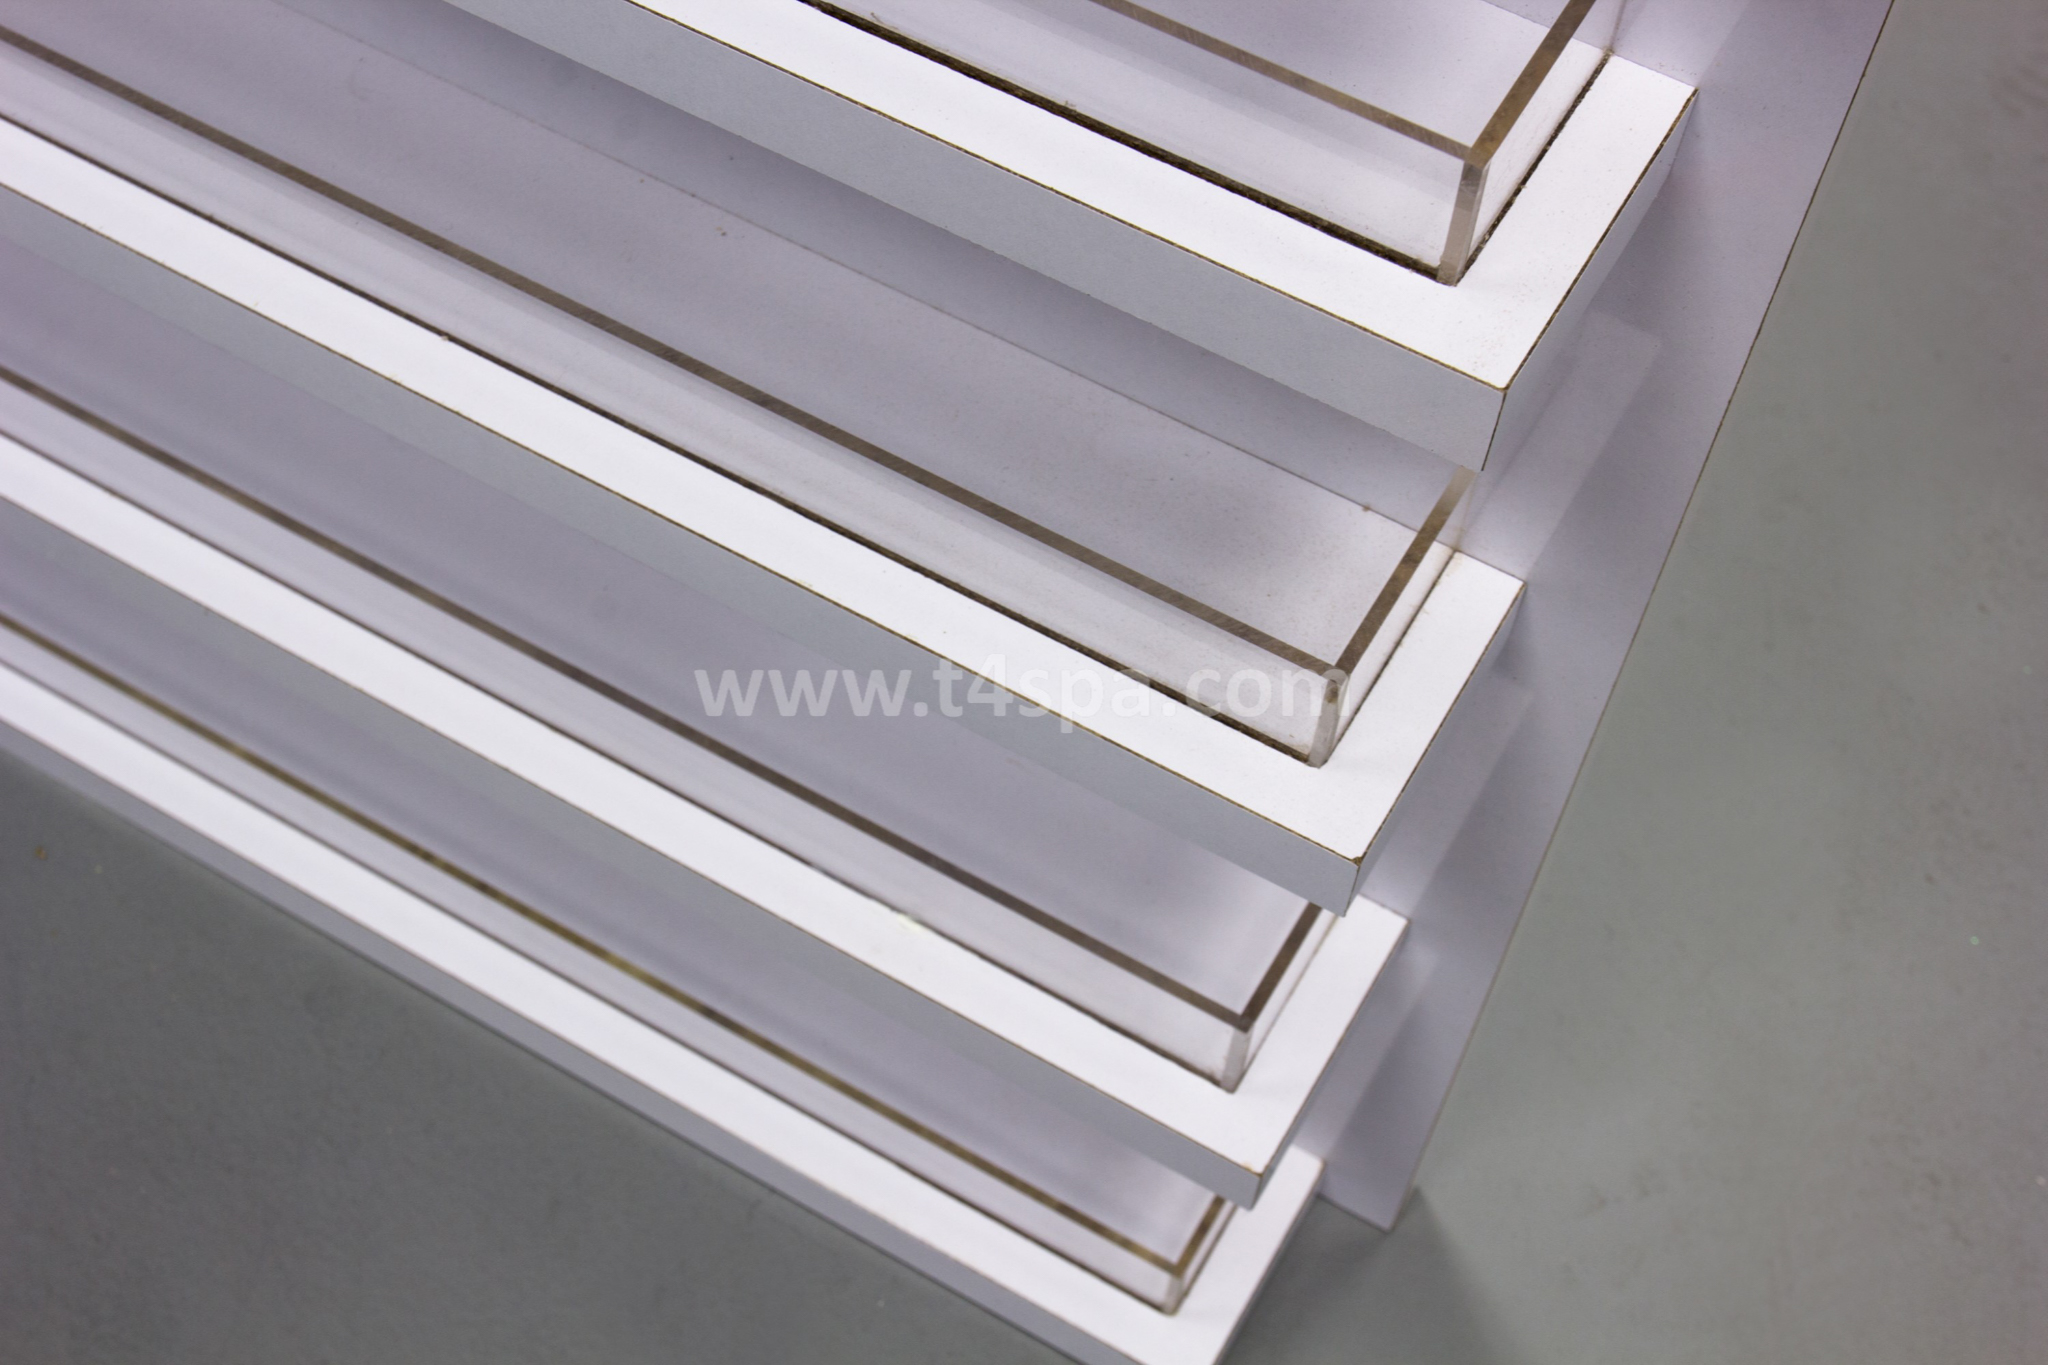 TD-9031 Wall Polish Rack Glossy White Detail (4)